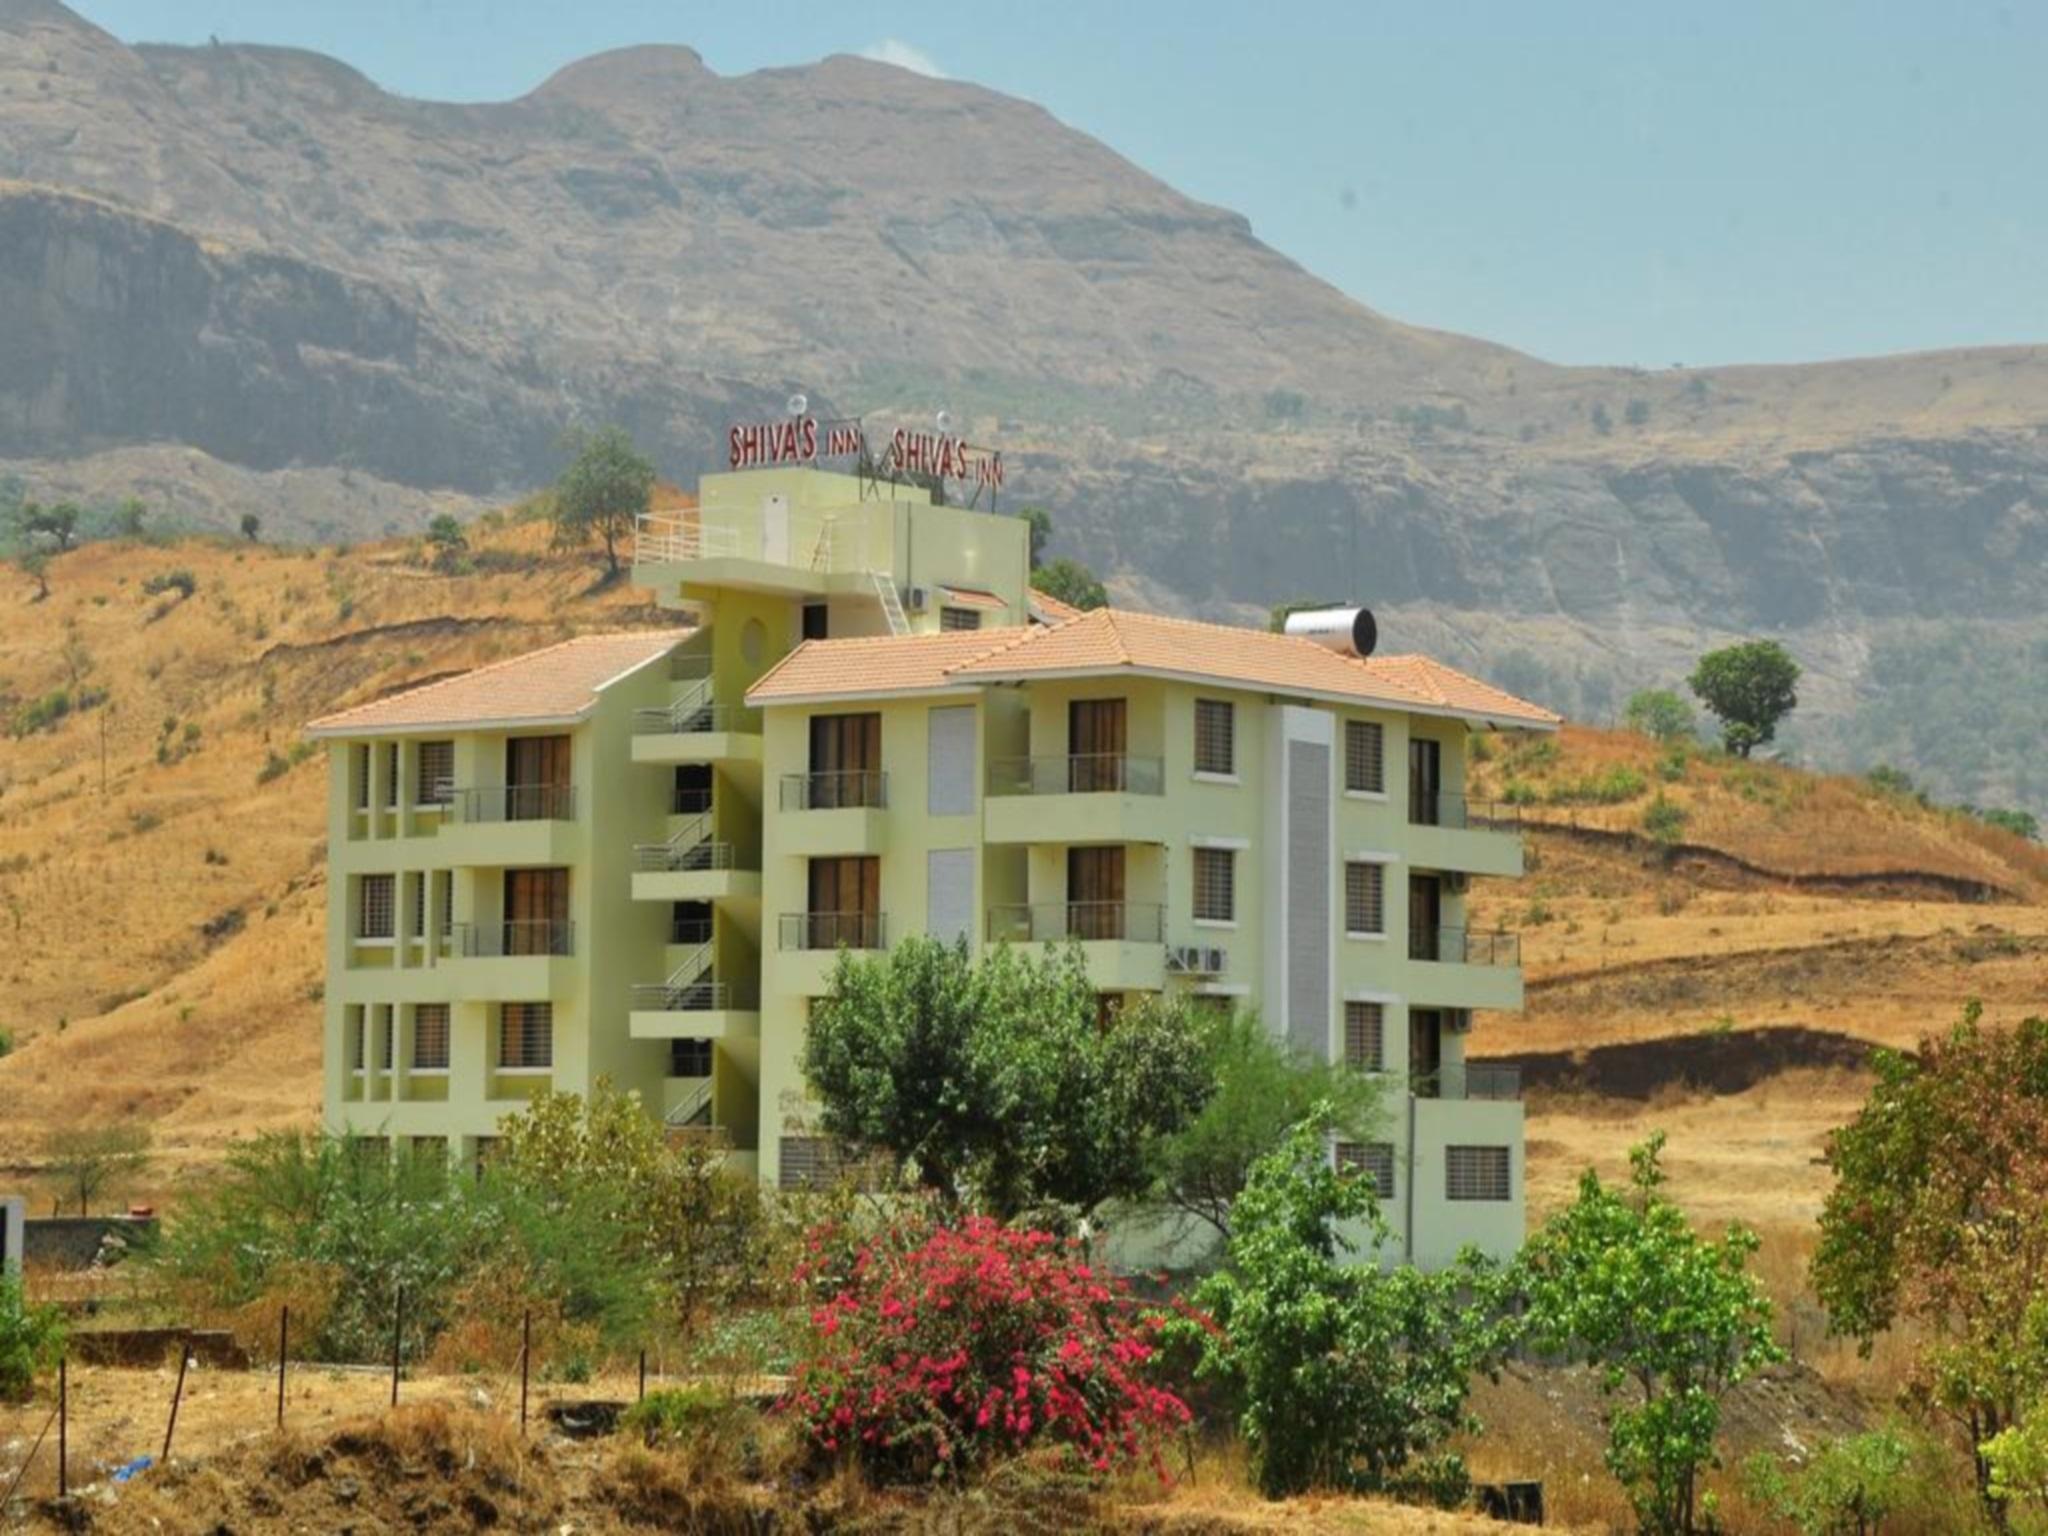 Hotel Shivas Inn